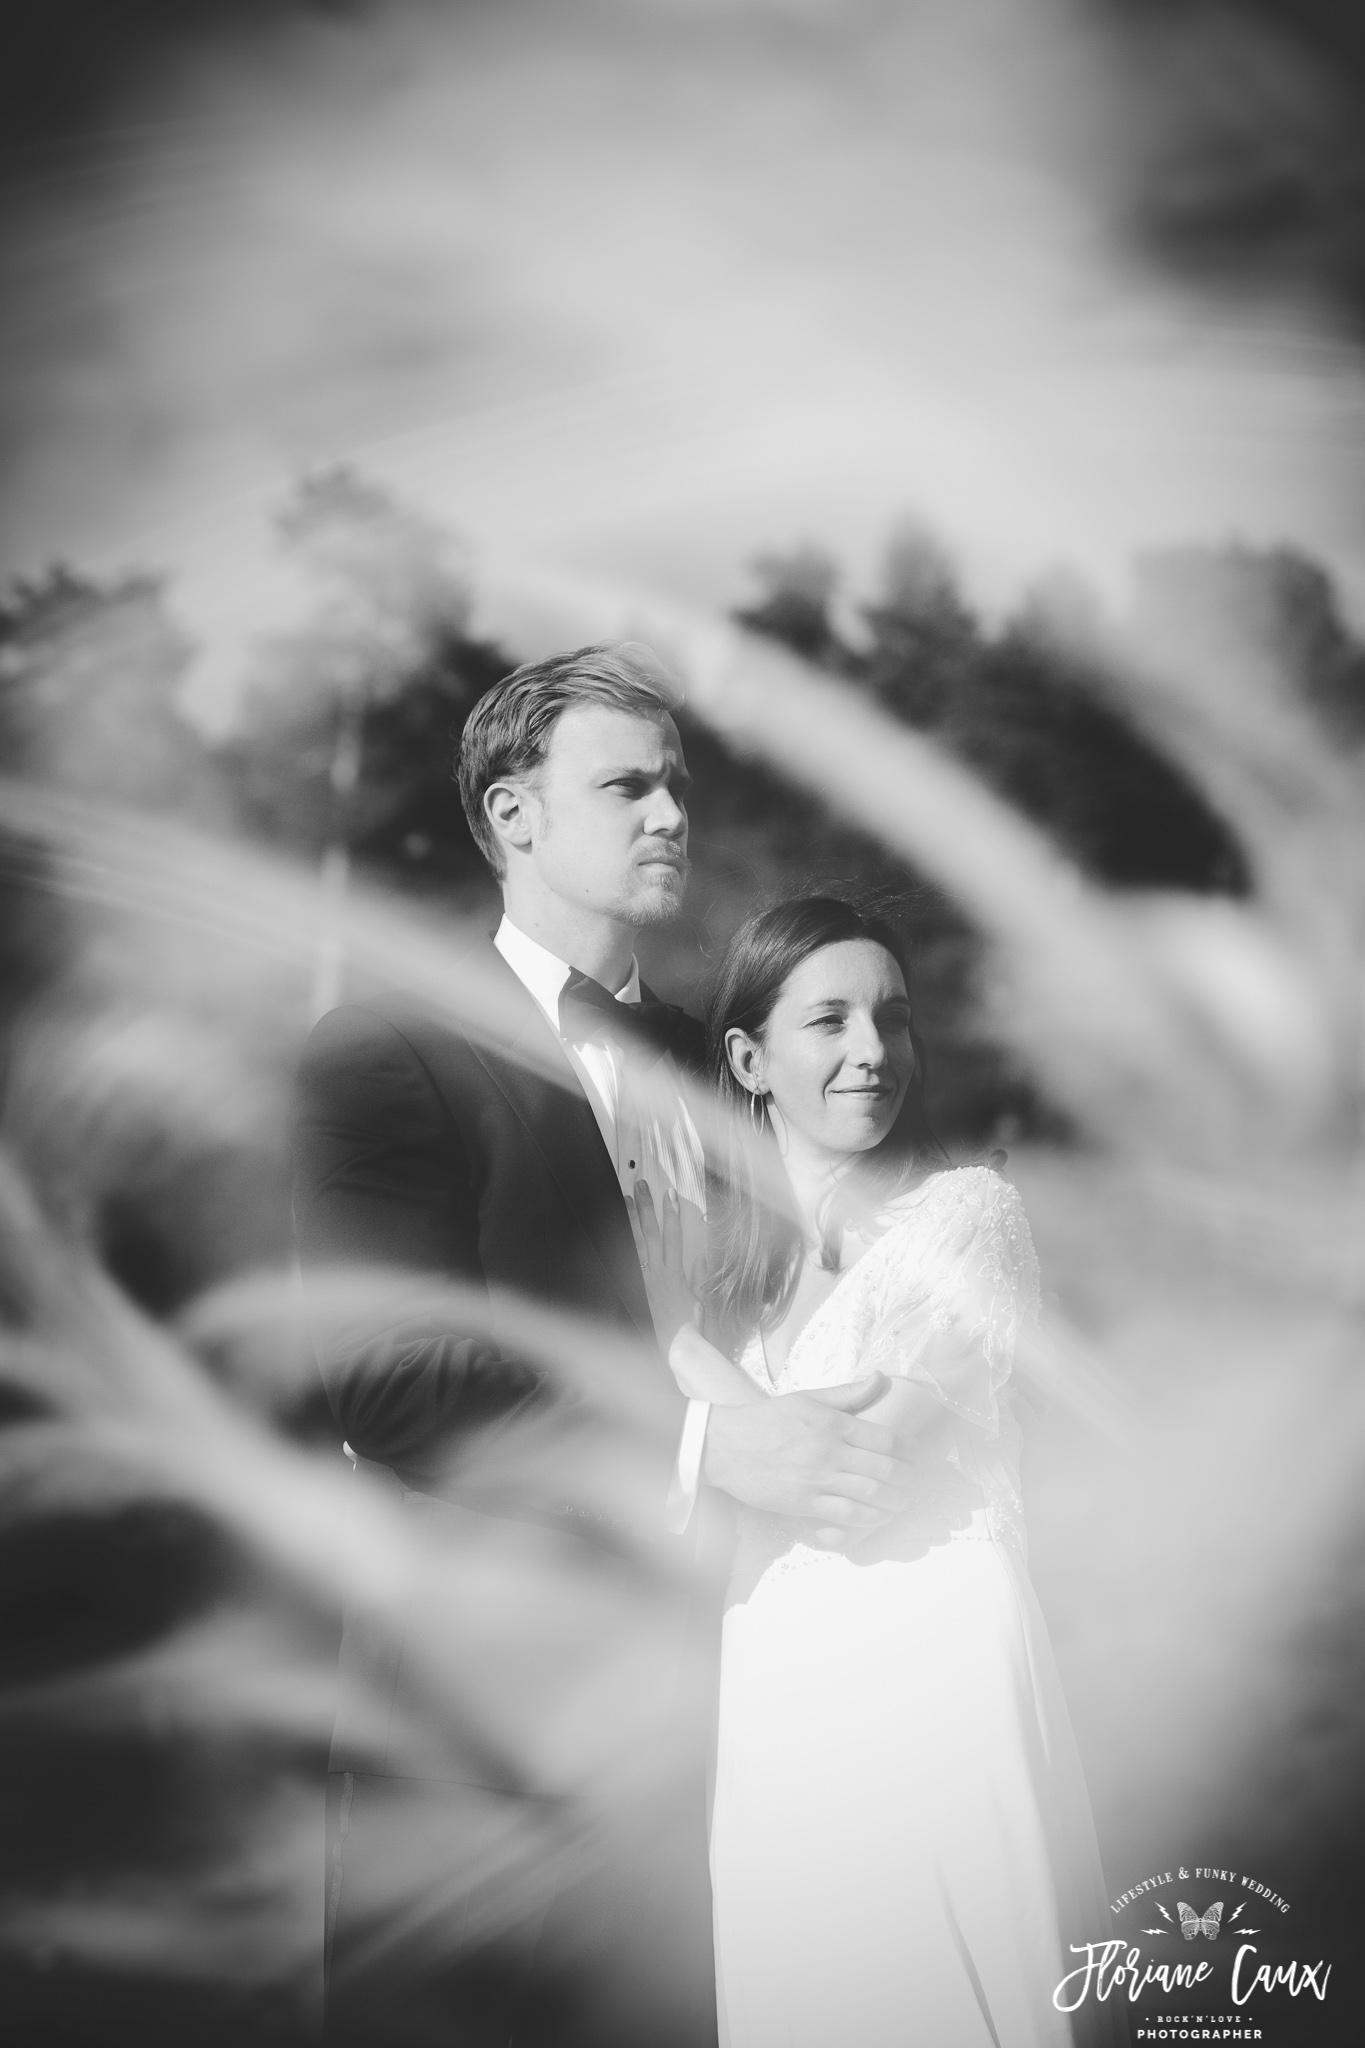 destination-wedding-photographer-oslo-norway-floriane-caux-76